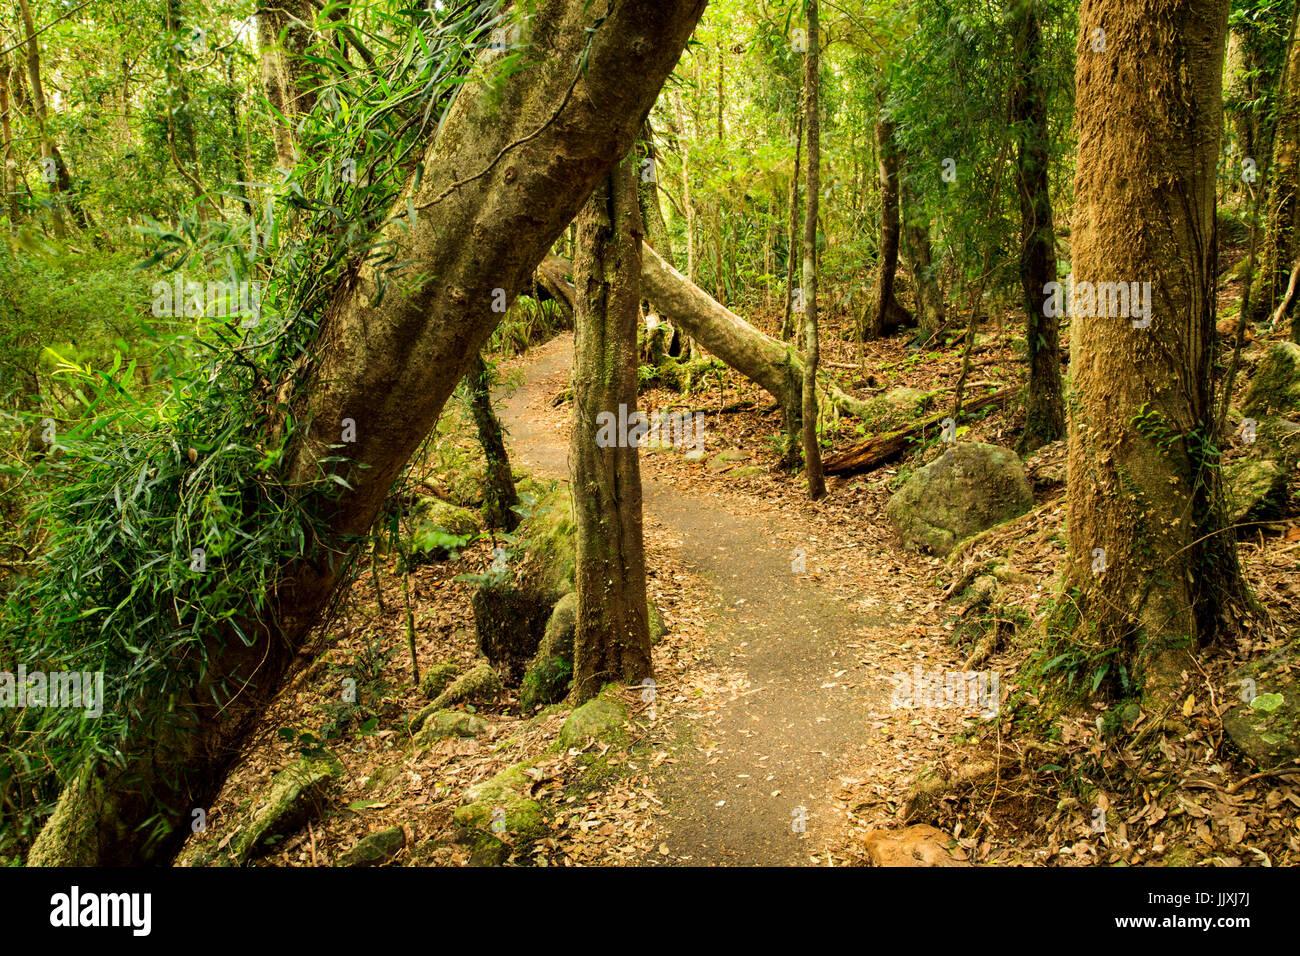 Rainforest walk in Springbrook National Park, Gold Coast Hinterland, Queensland, Australia - Stock Image